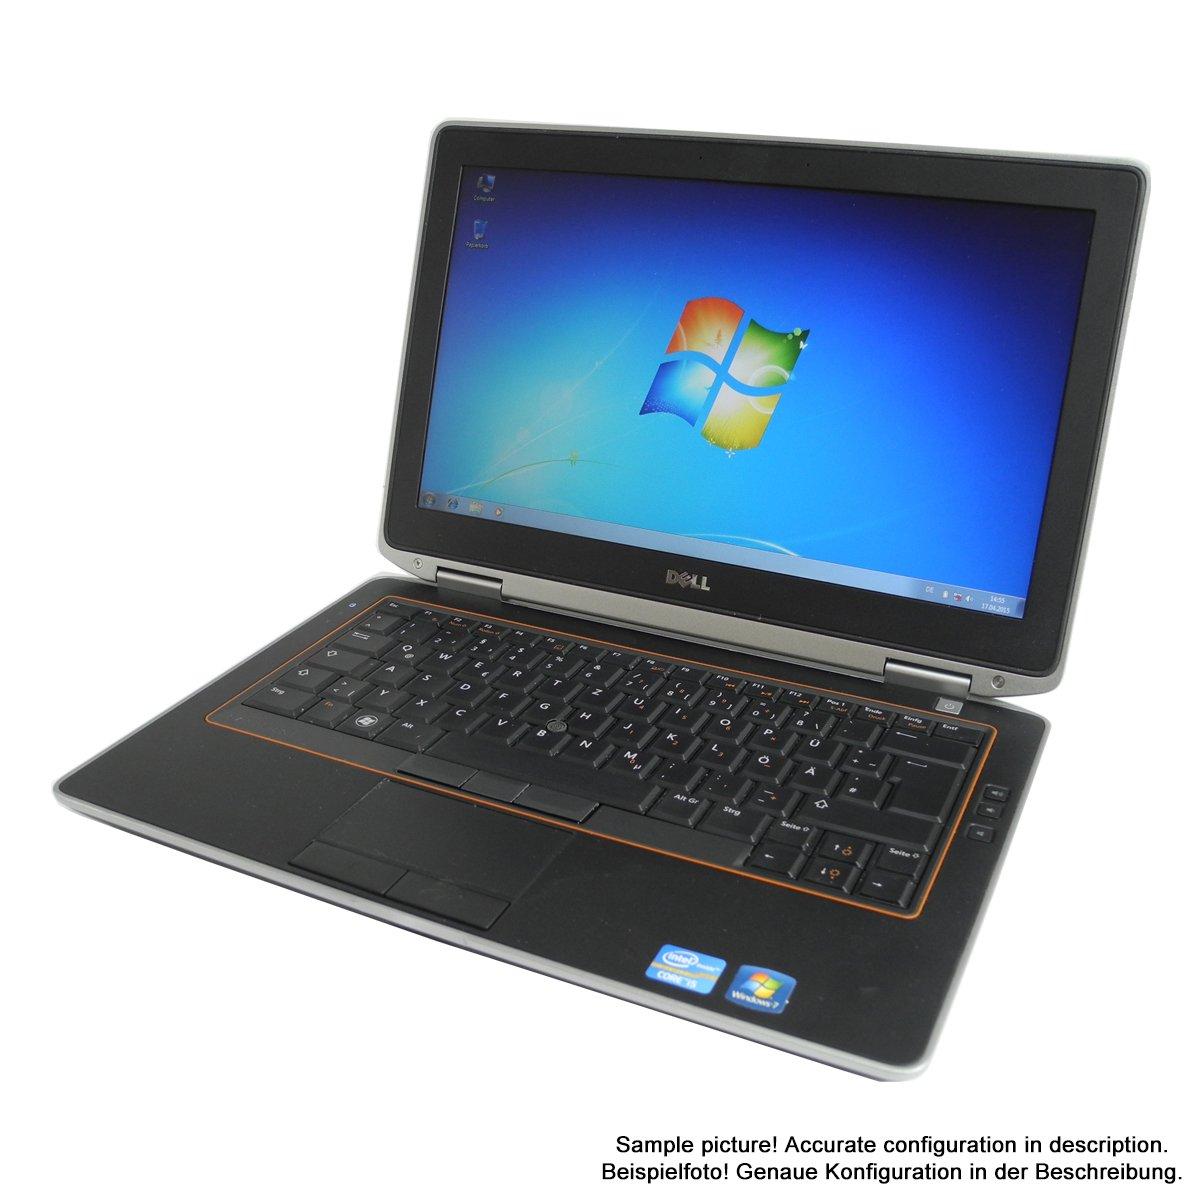 DELL Latitude E6320 34 cm (13,3) Ordenador Portátil (Intel Core i5 2.5 GHz, 4 GB RAM, 160 GB HDD, DVD, Win7 Pro): Amazon.es: Informática